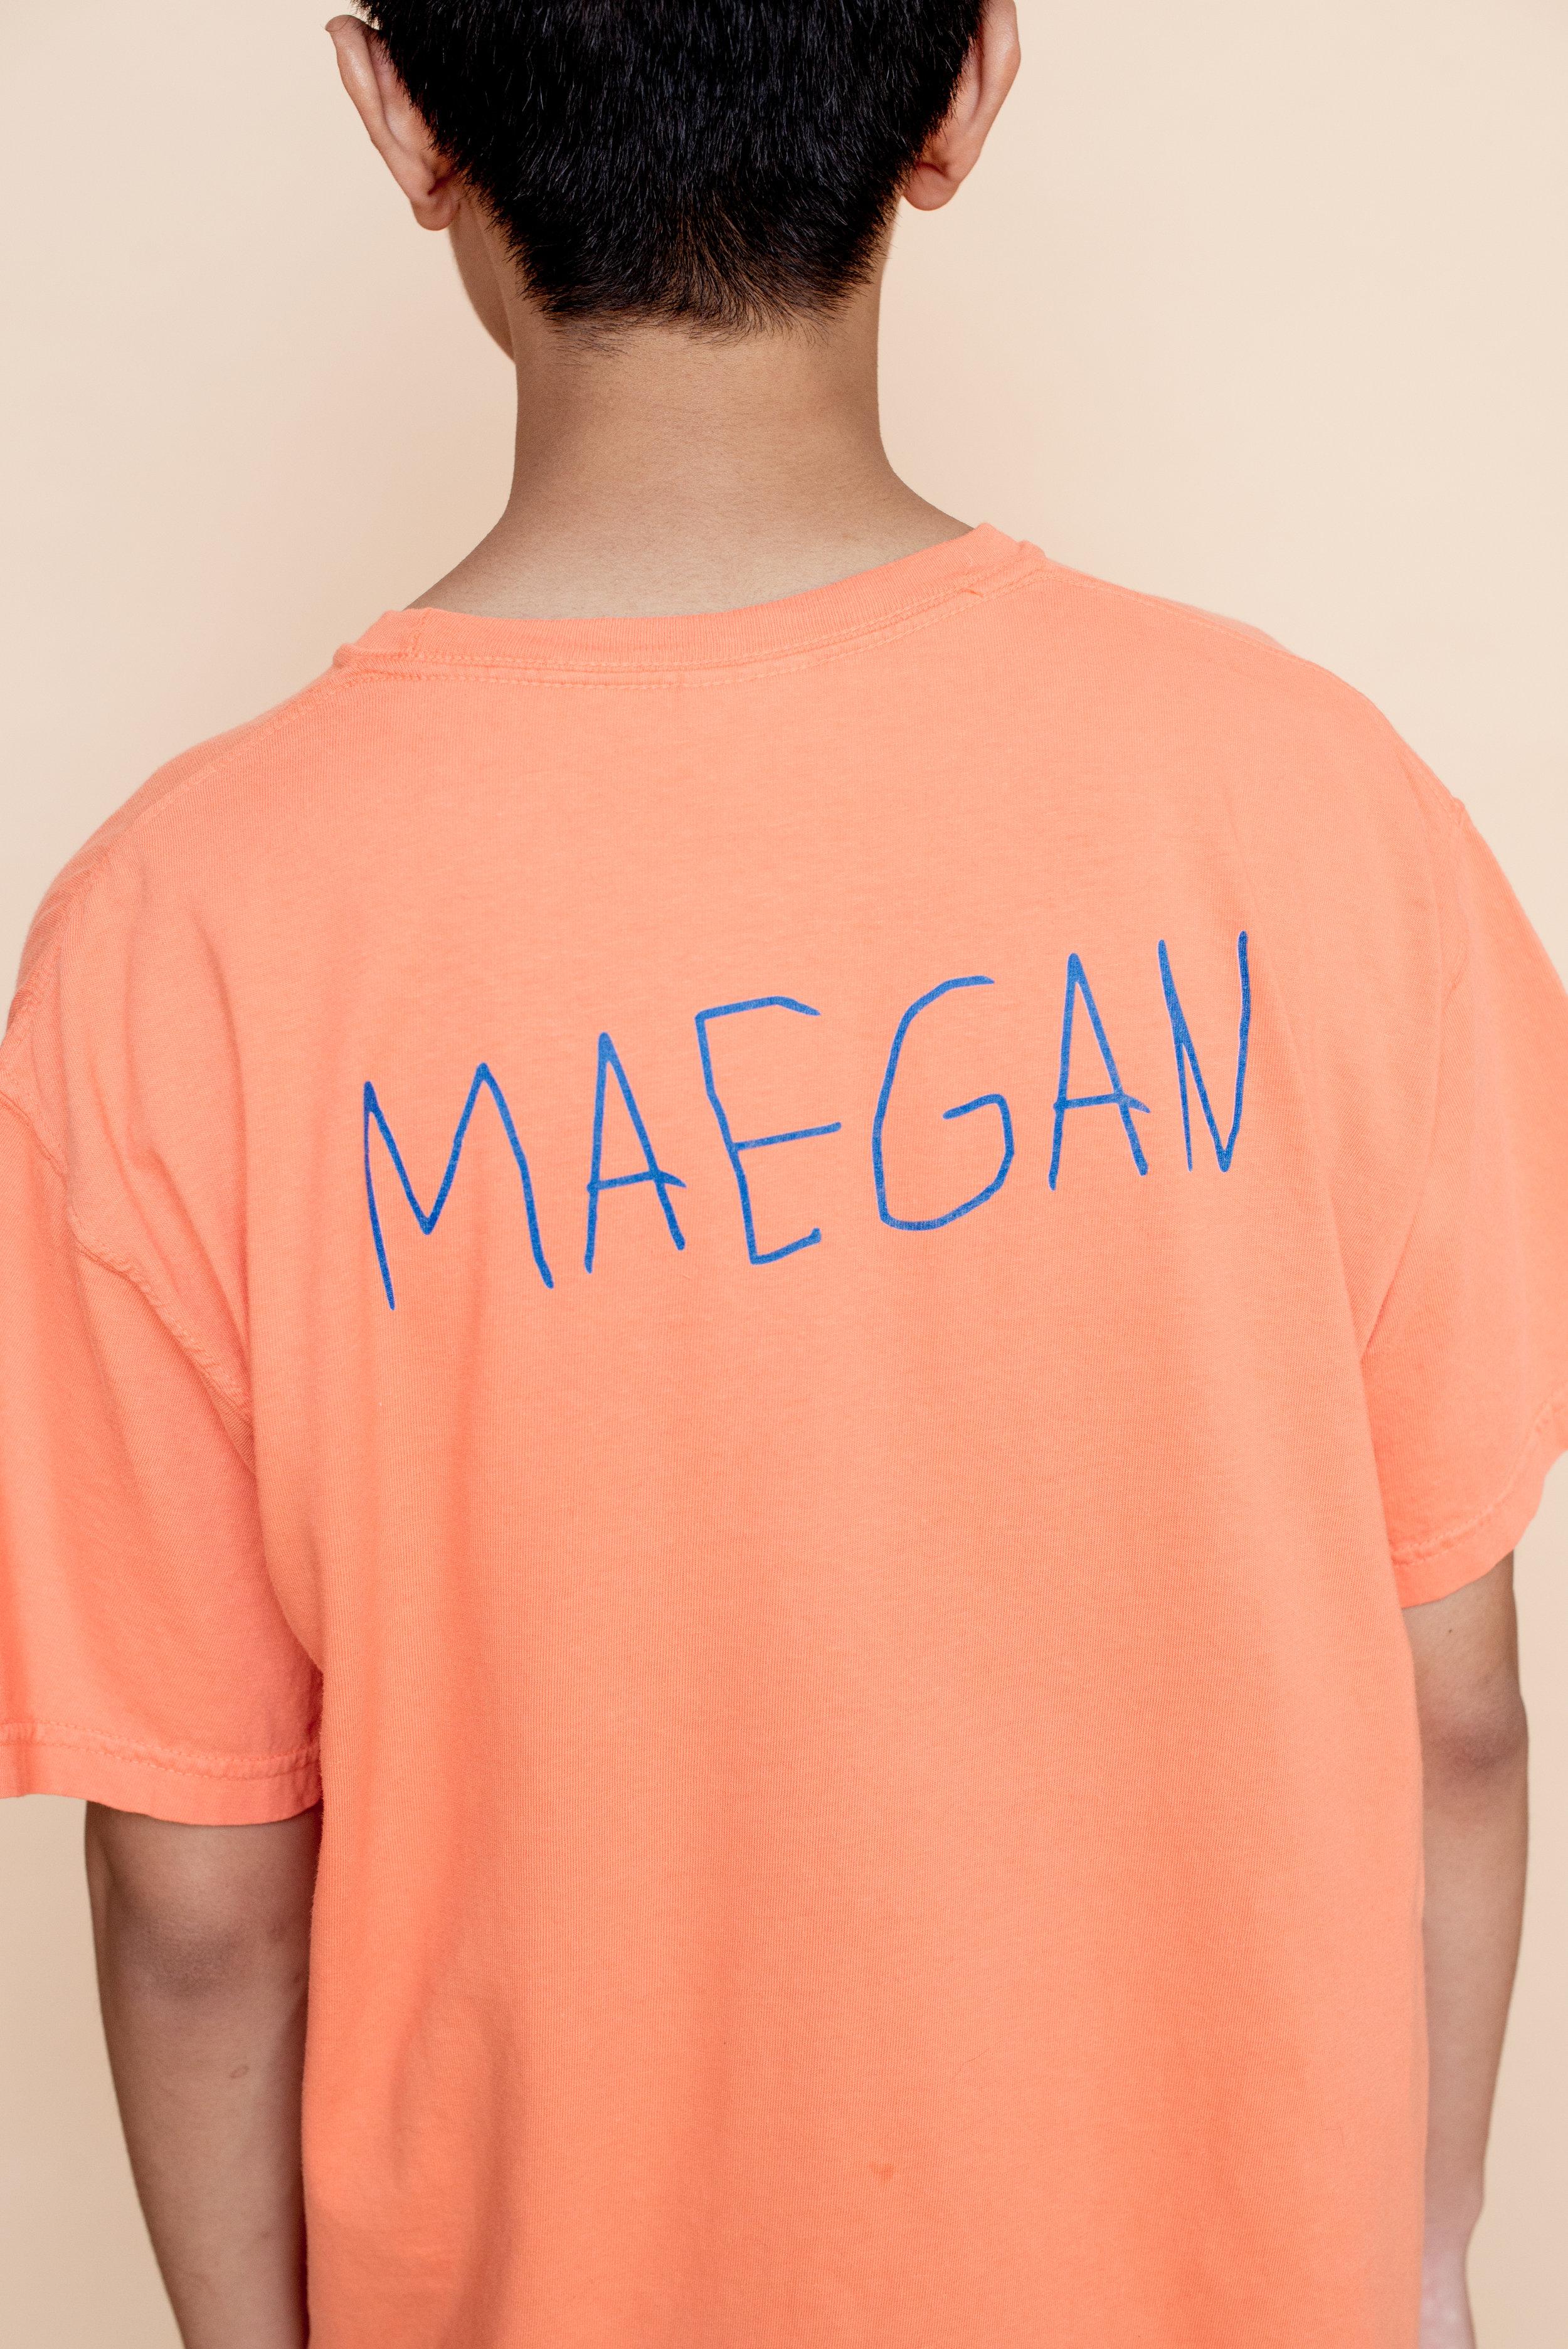 maegan (8 of 19).jpg